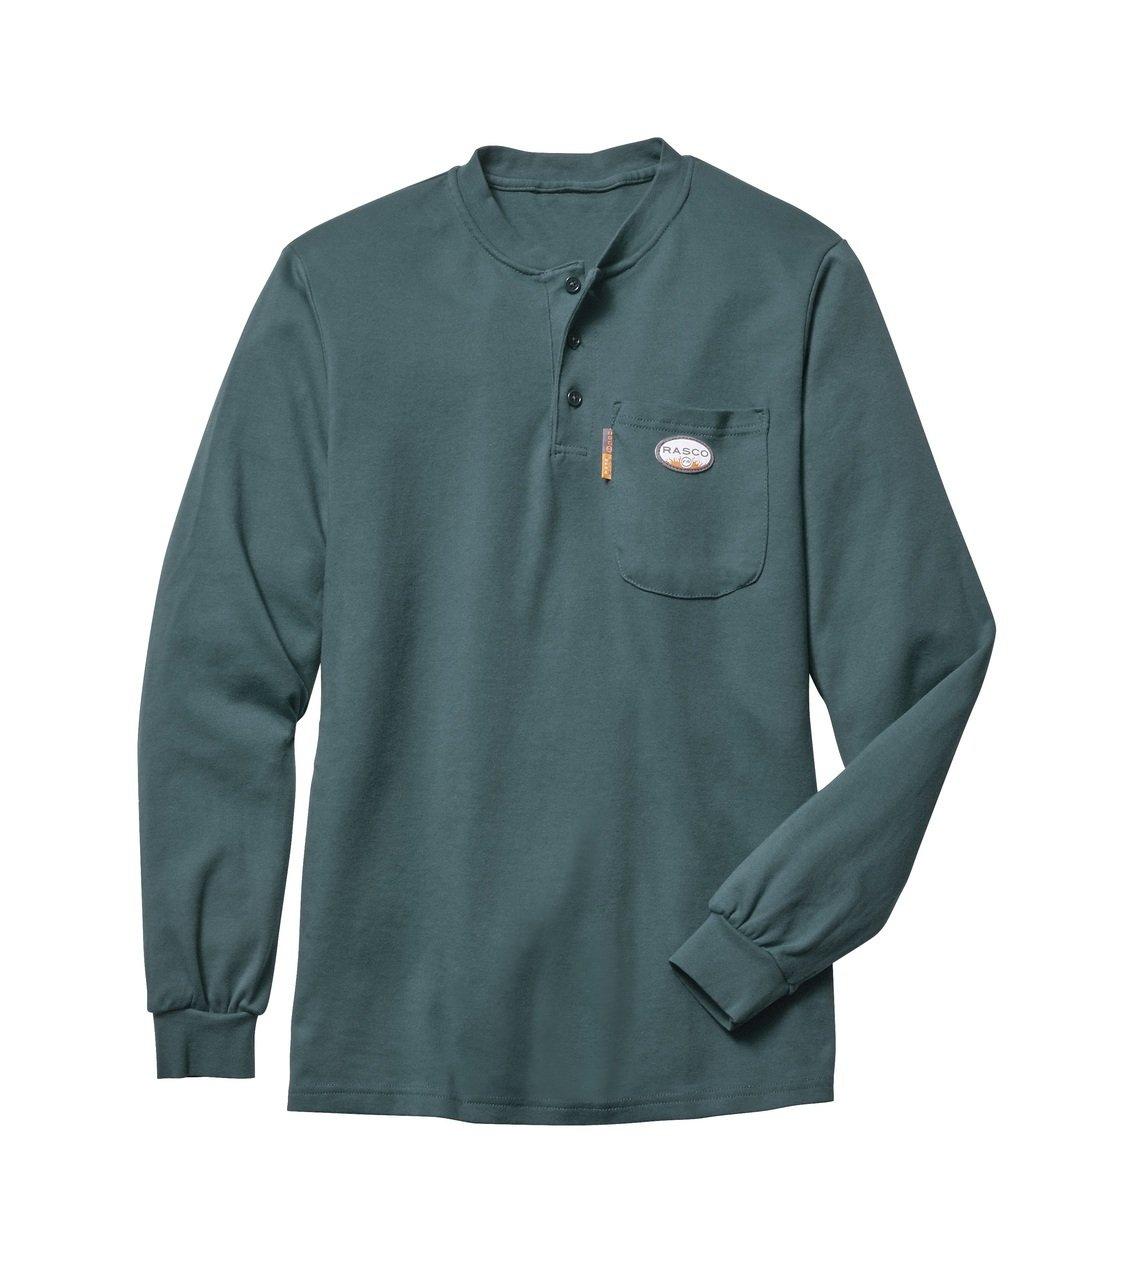 Rasco GRF460 Men's L/S HUNTER GREEN FR T-Shirt Hunter Green Small